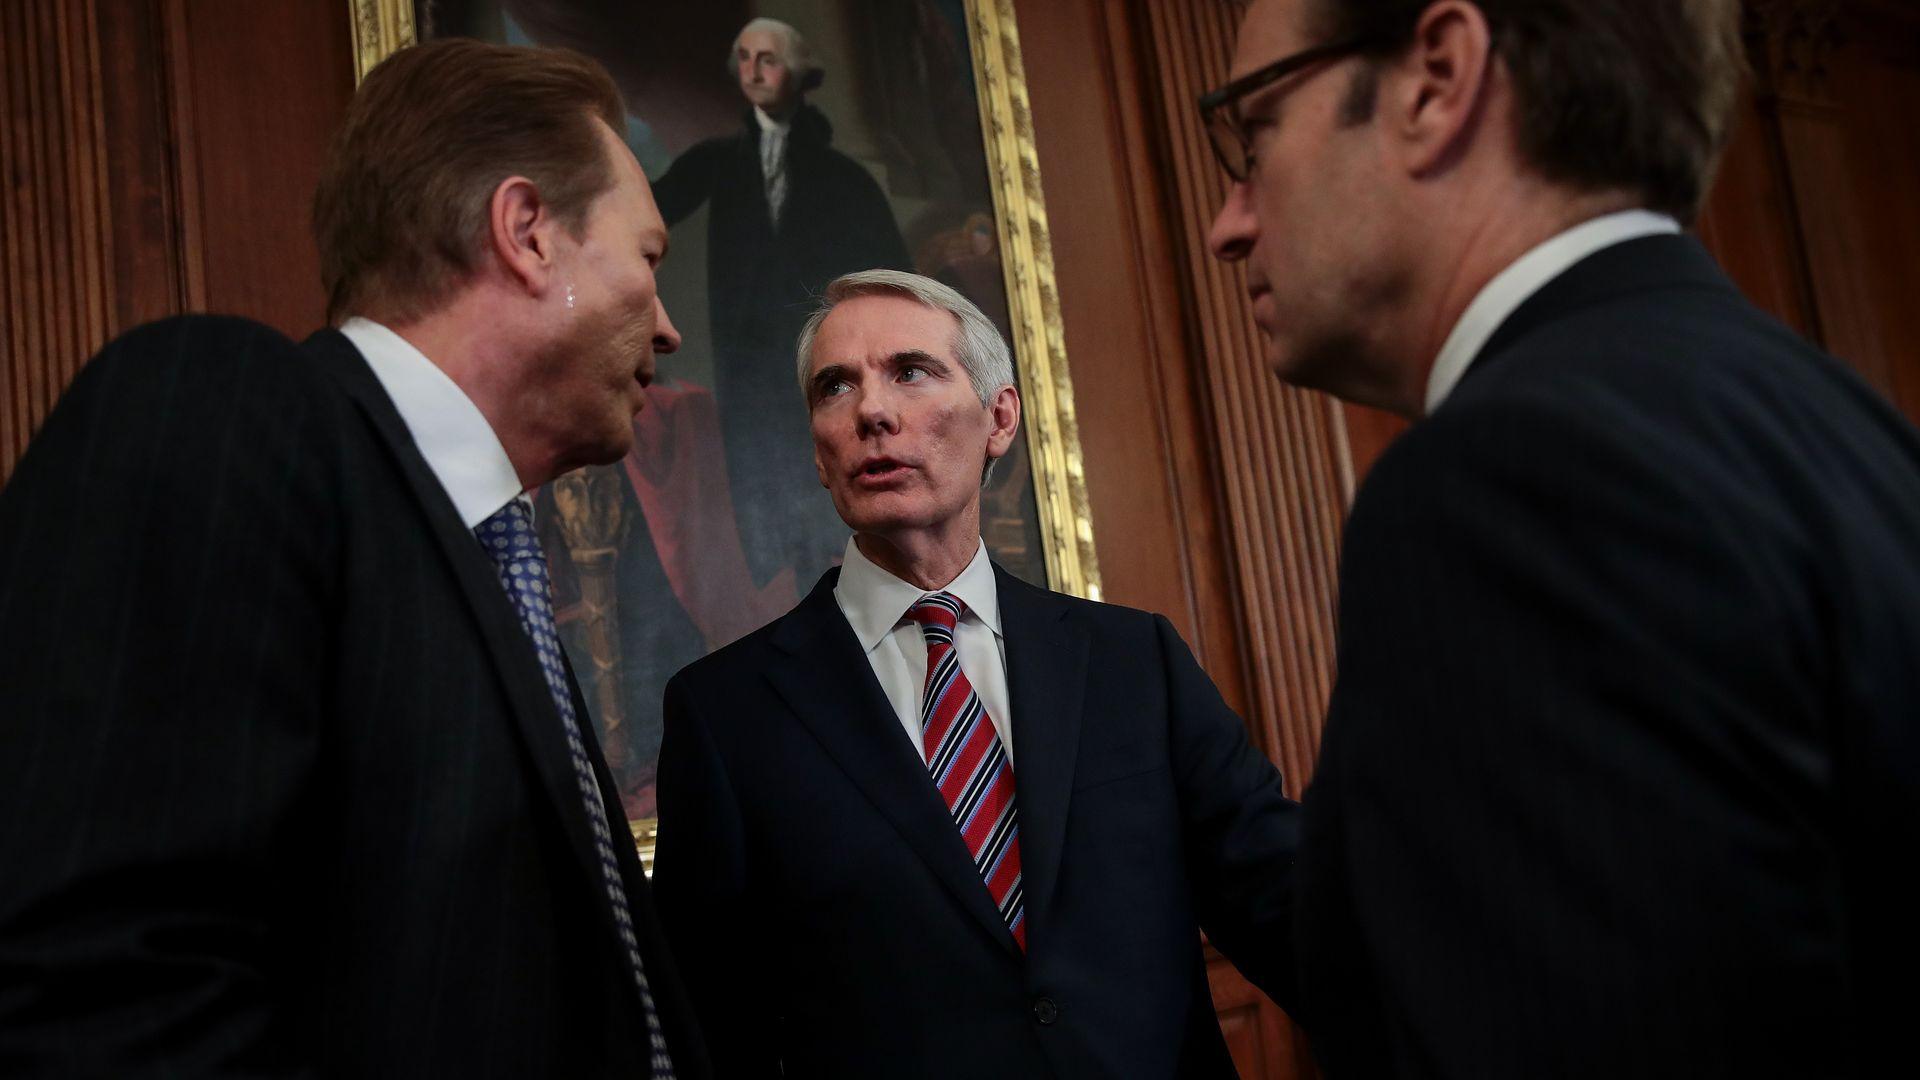 Senator Rob Portman speaks with two men